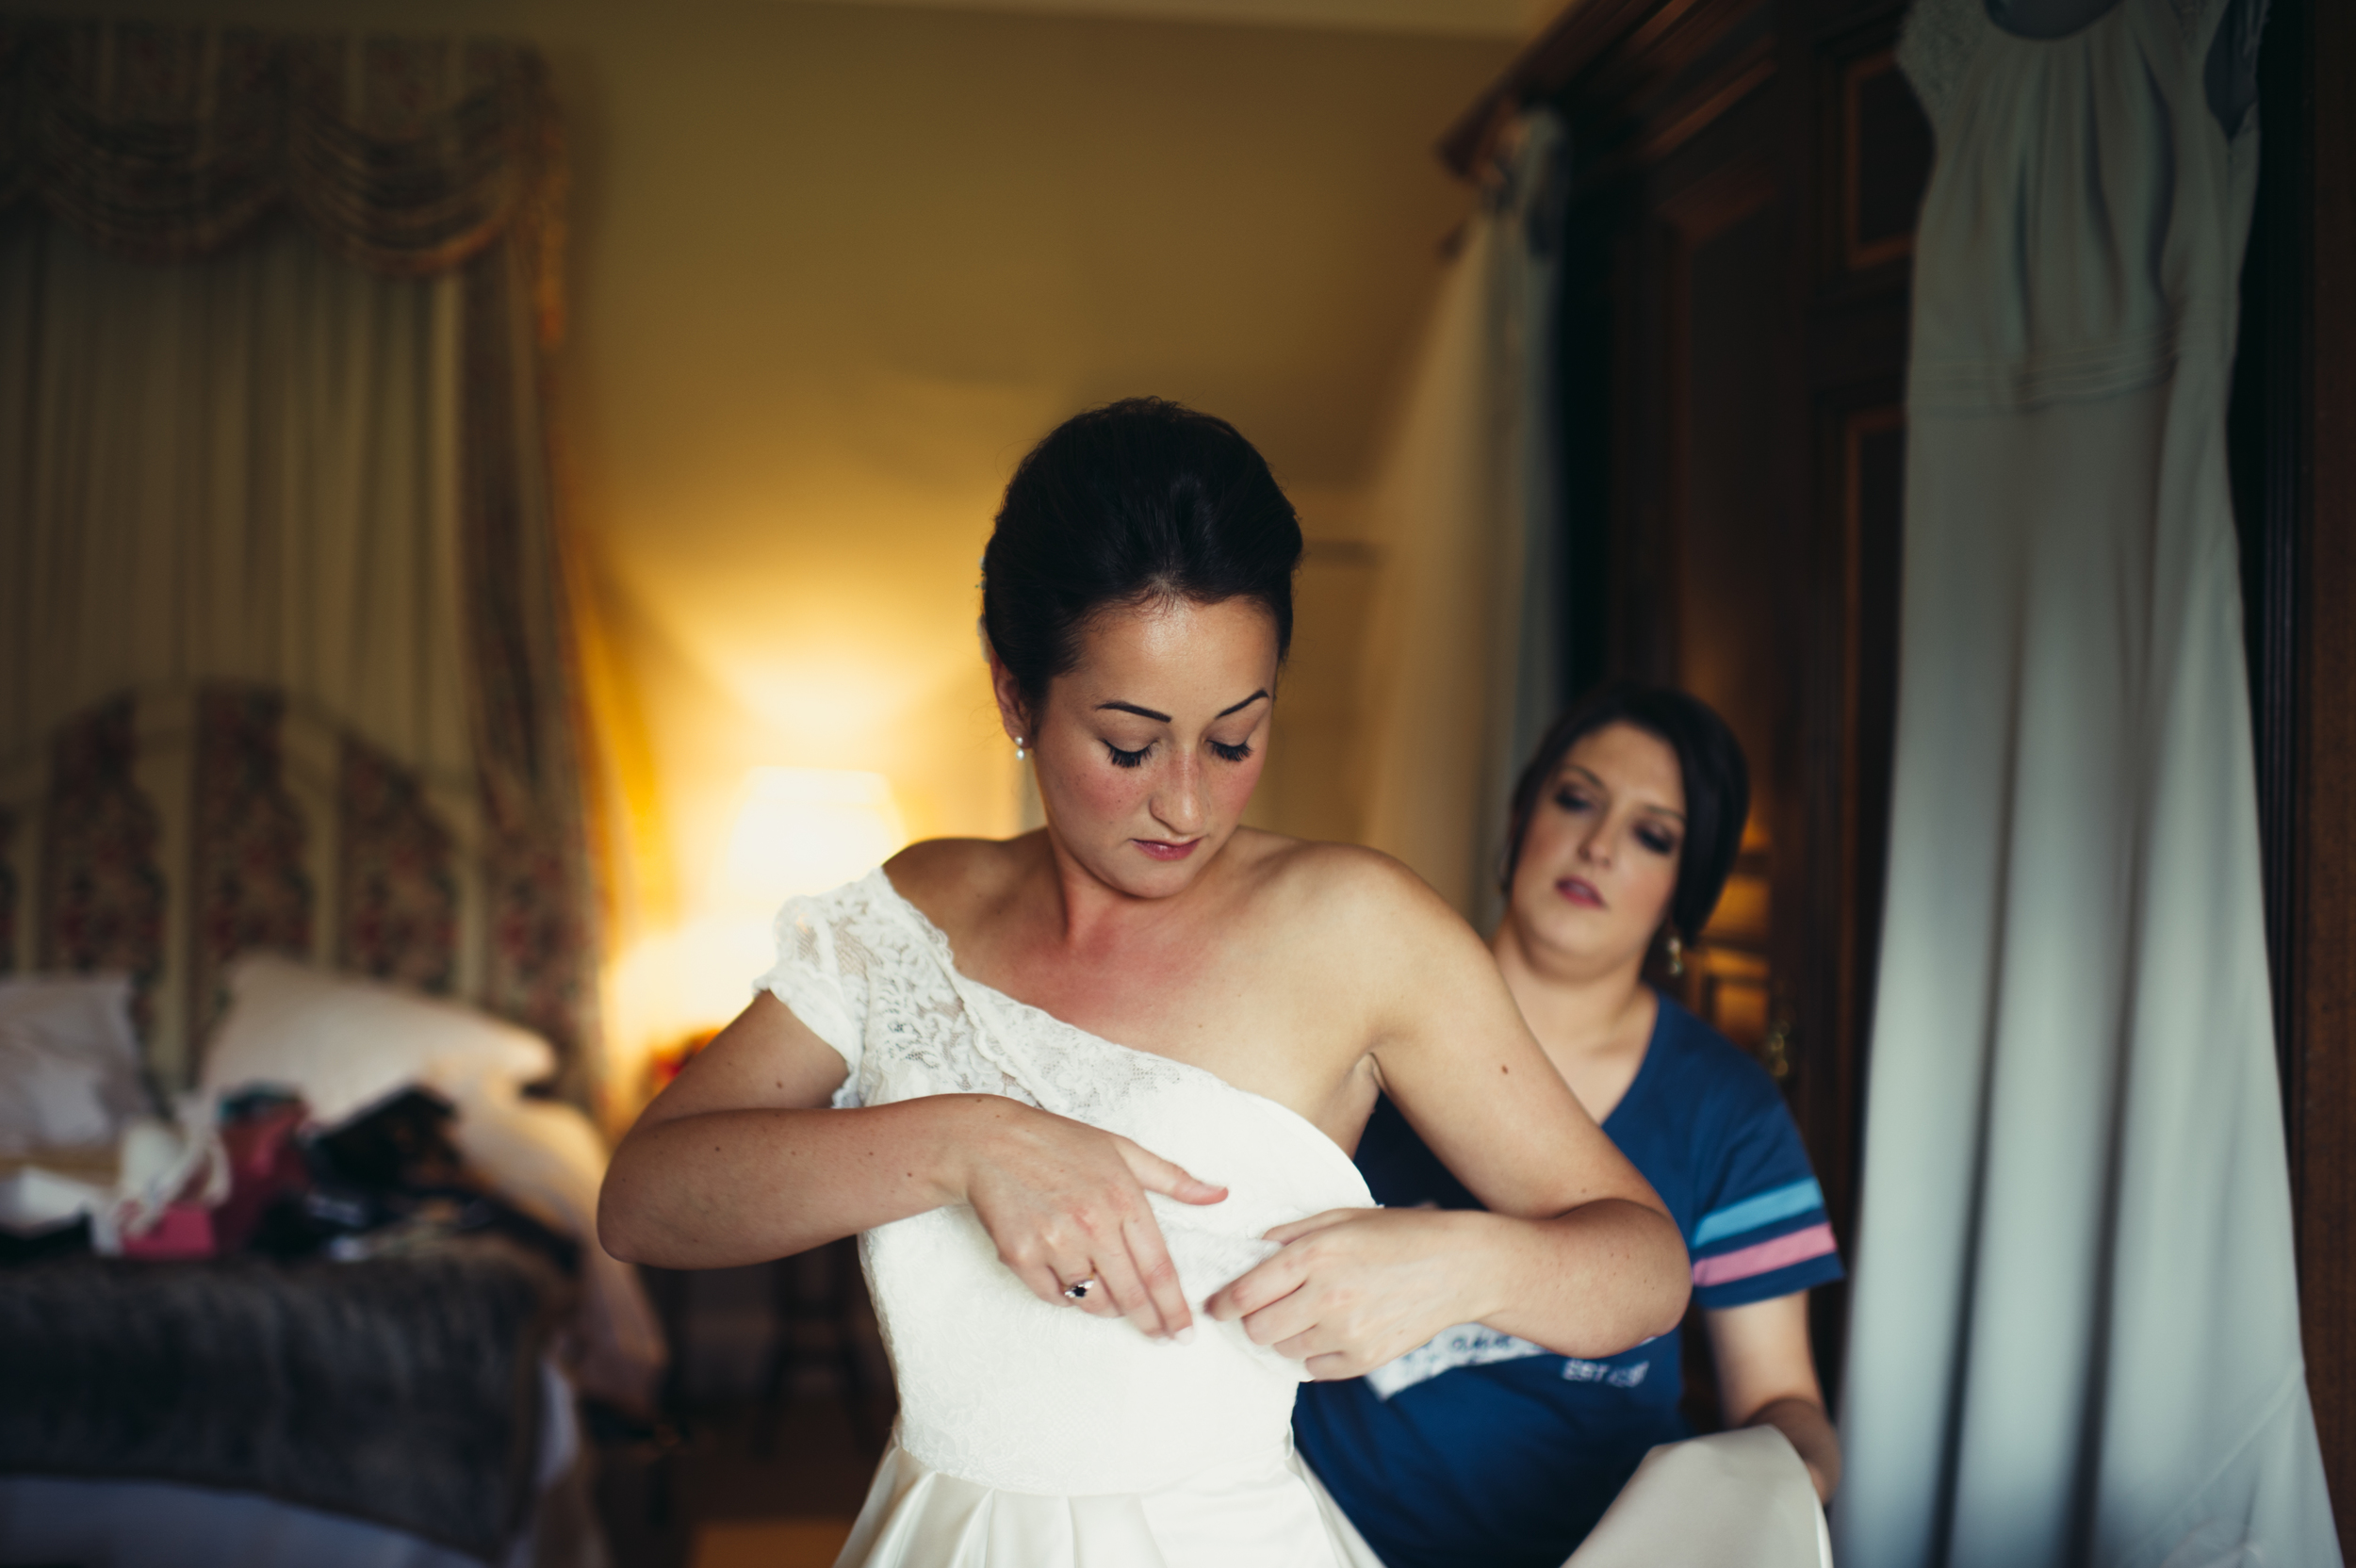 0066-lisa-devine-alternative-creative-wedding-photography-glasgow-edinburgh.JPG